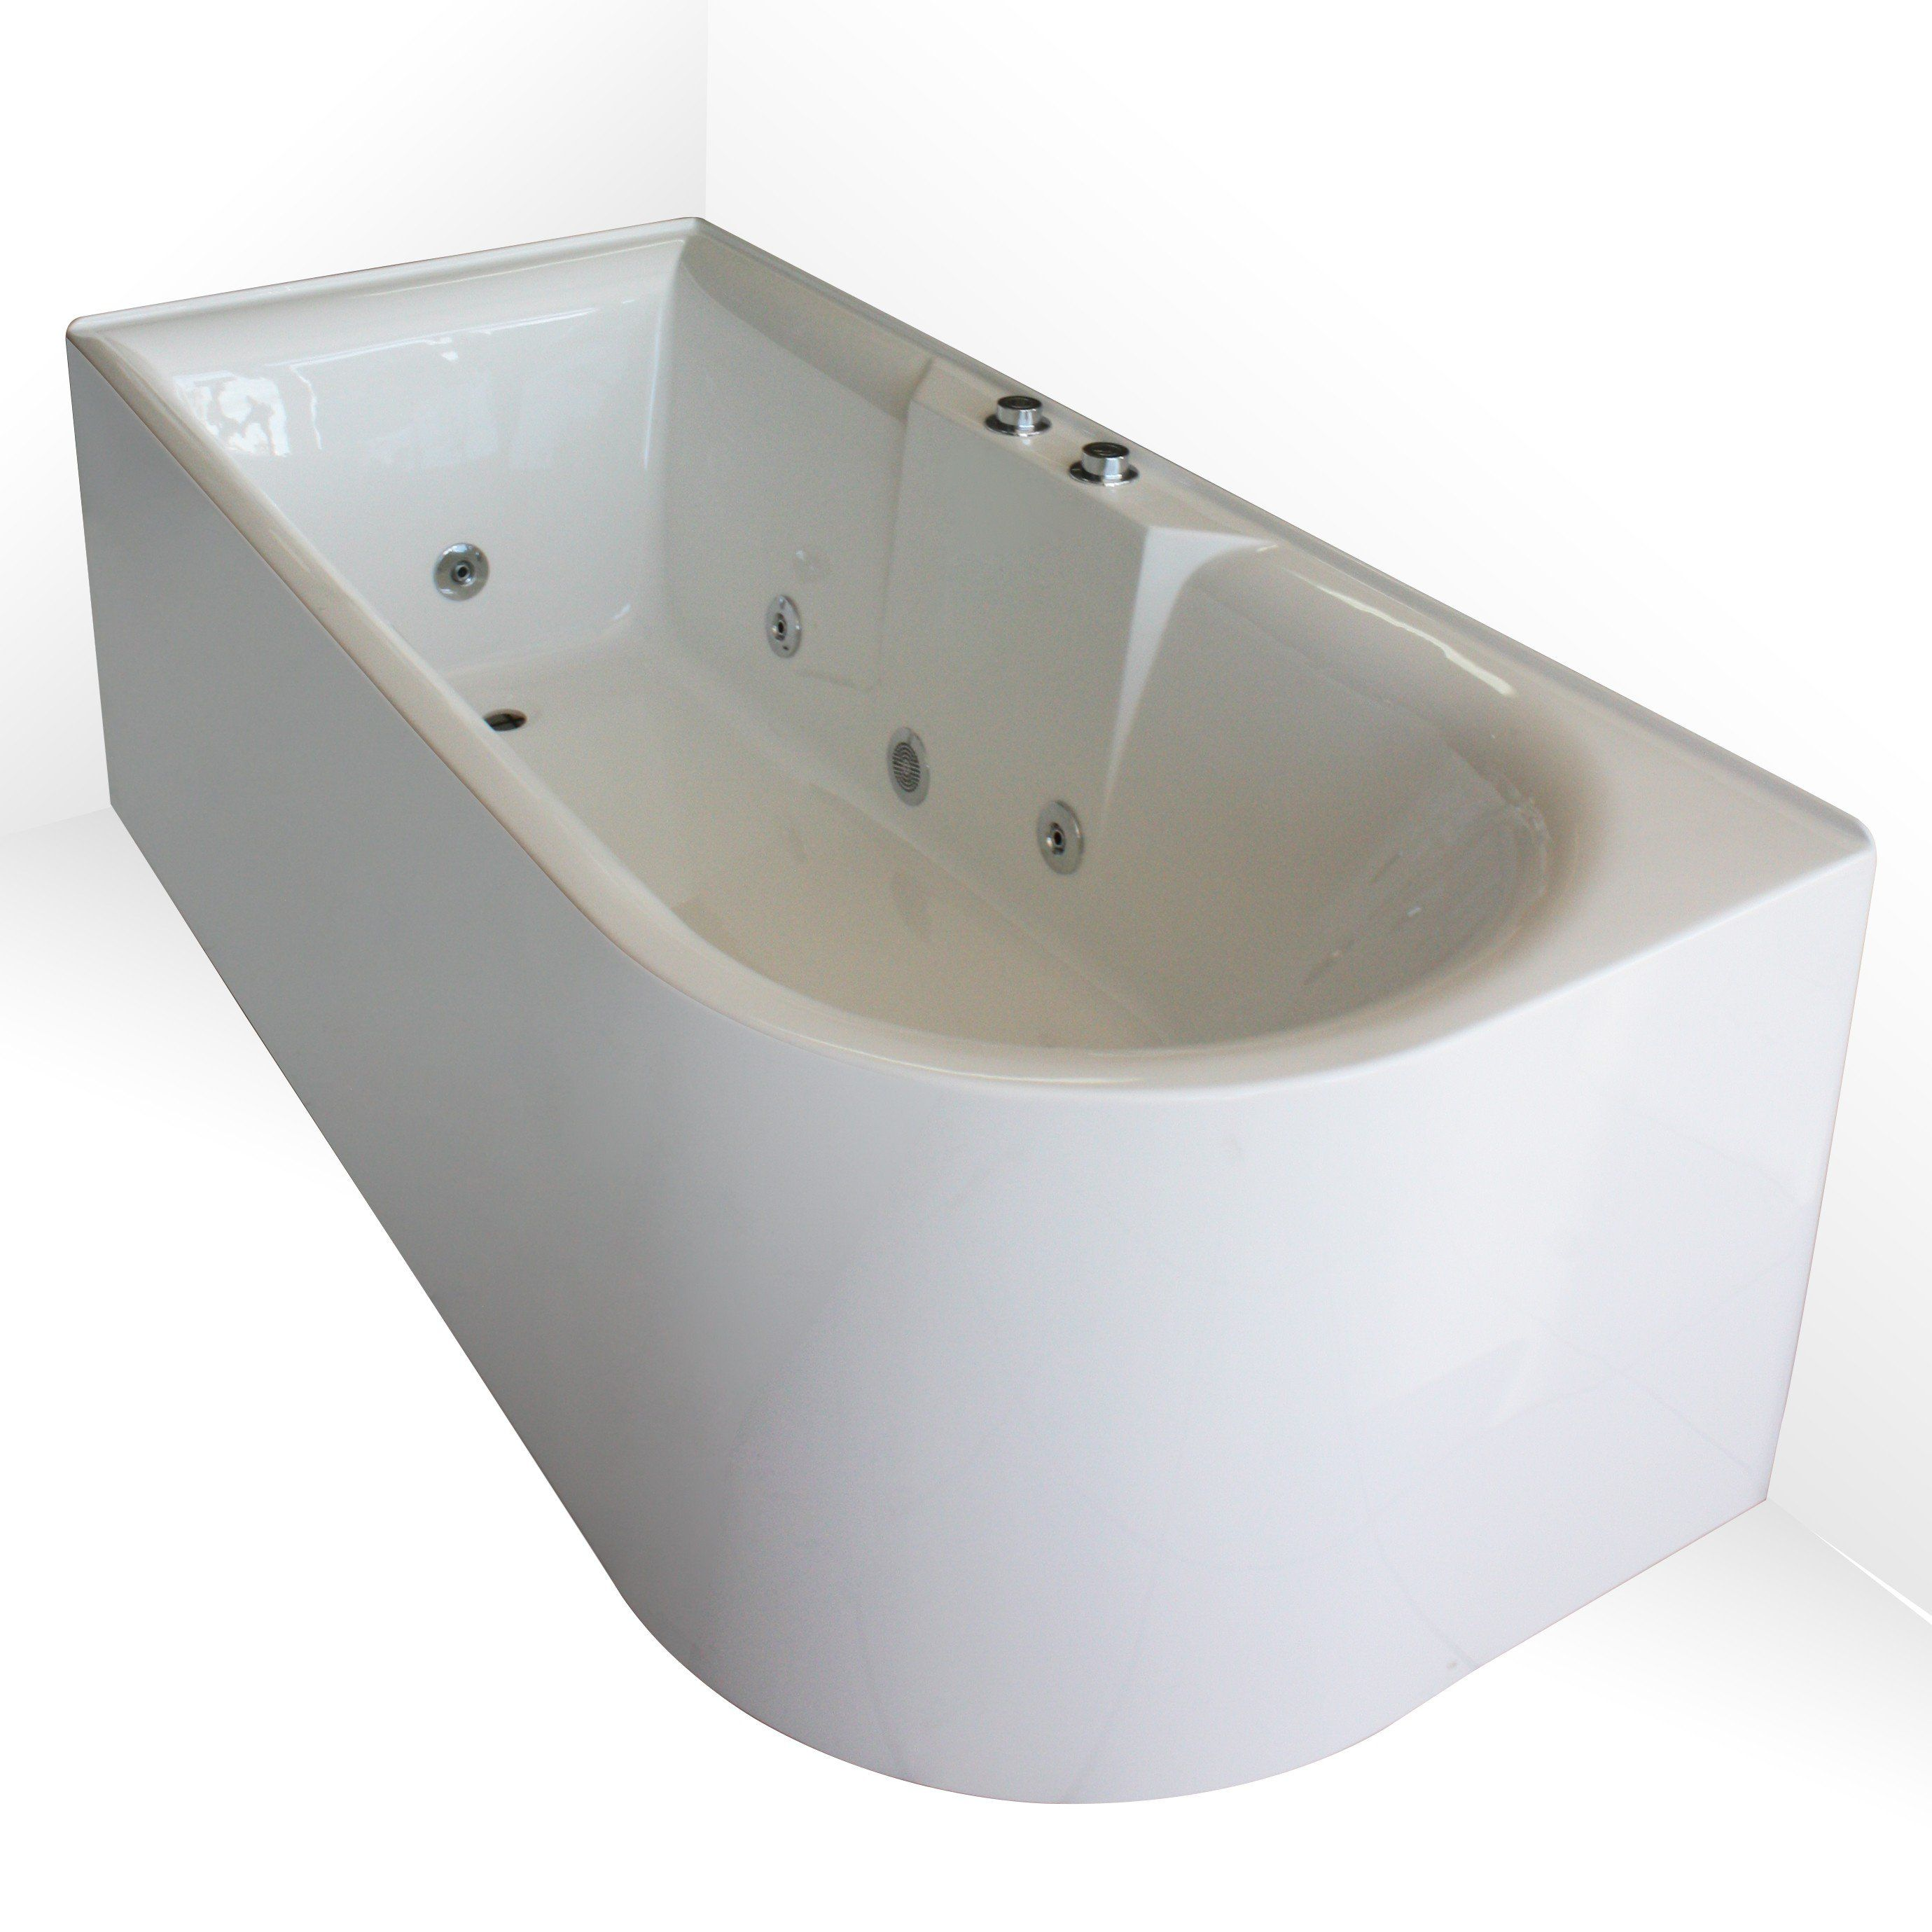 Aqua Freestanding Corner Spa Right 1700mm | The home | Pinterest ...